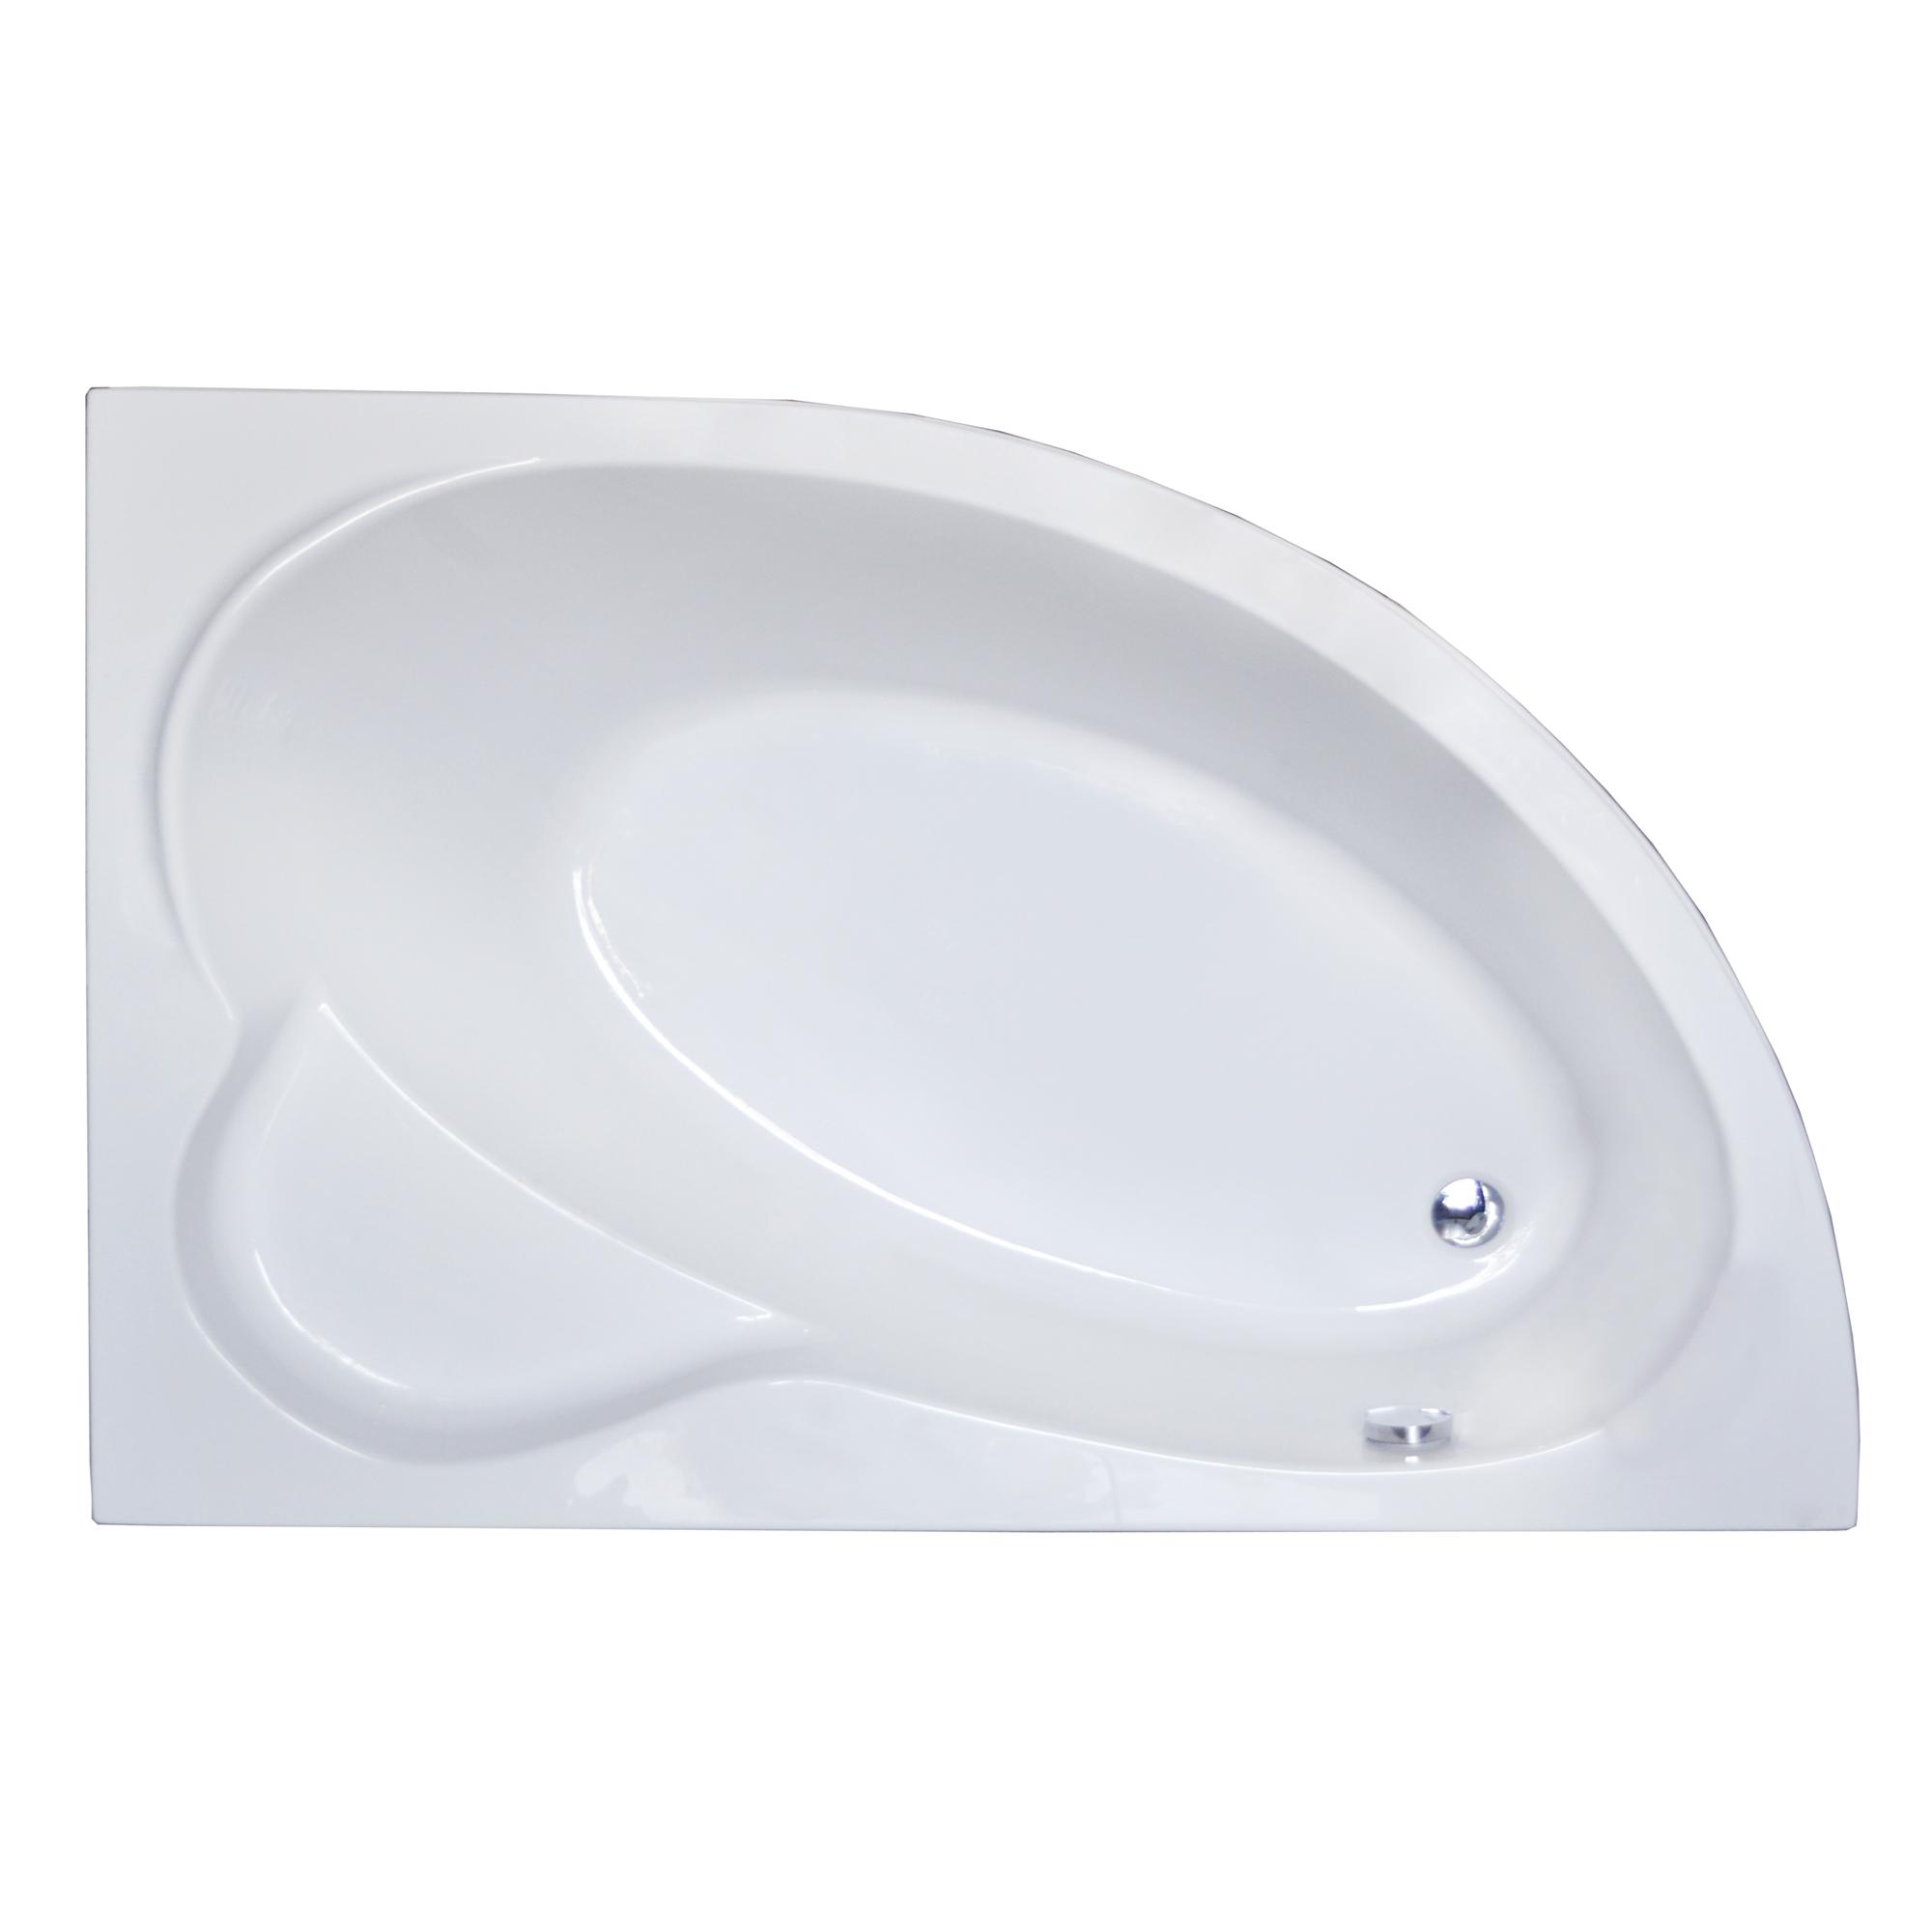 Акриловая ванна Royal bath Alpine RB819103 140х95 R акриловая ванна royal bath alpine rb 819101 правая 160х100 rb819101r